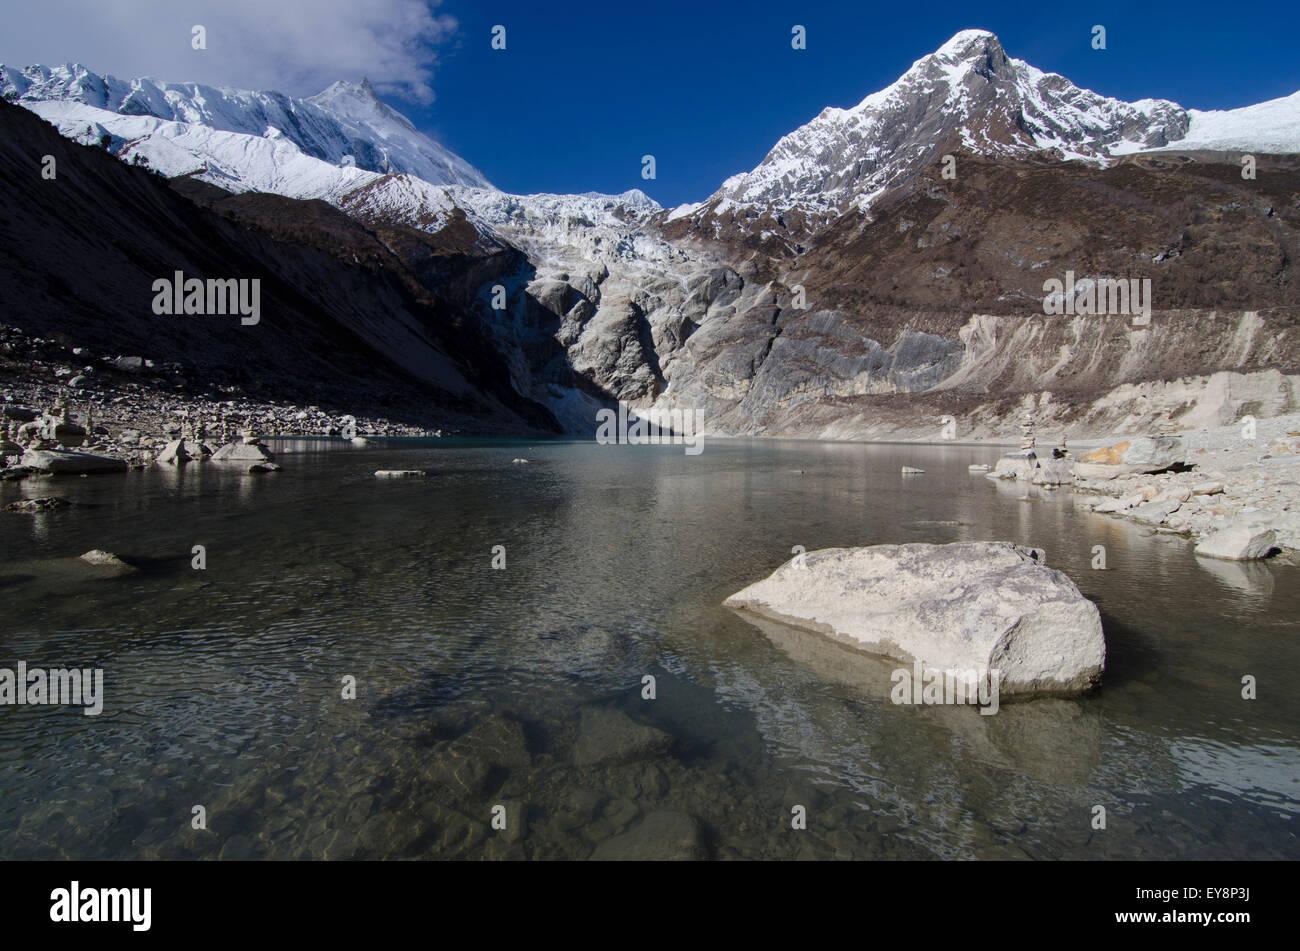 Birendra lake at the botom of the Manaslu glacier Stock Photo